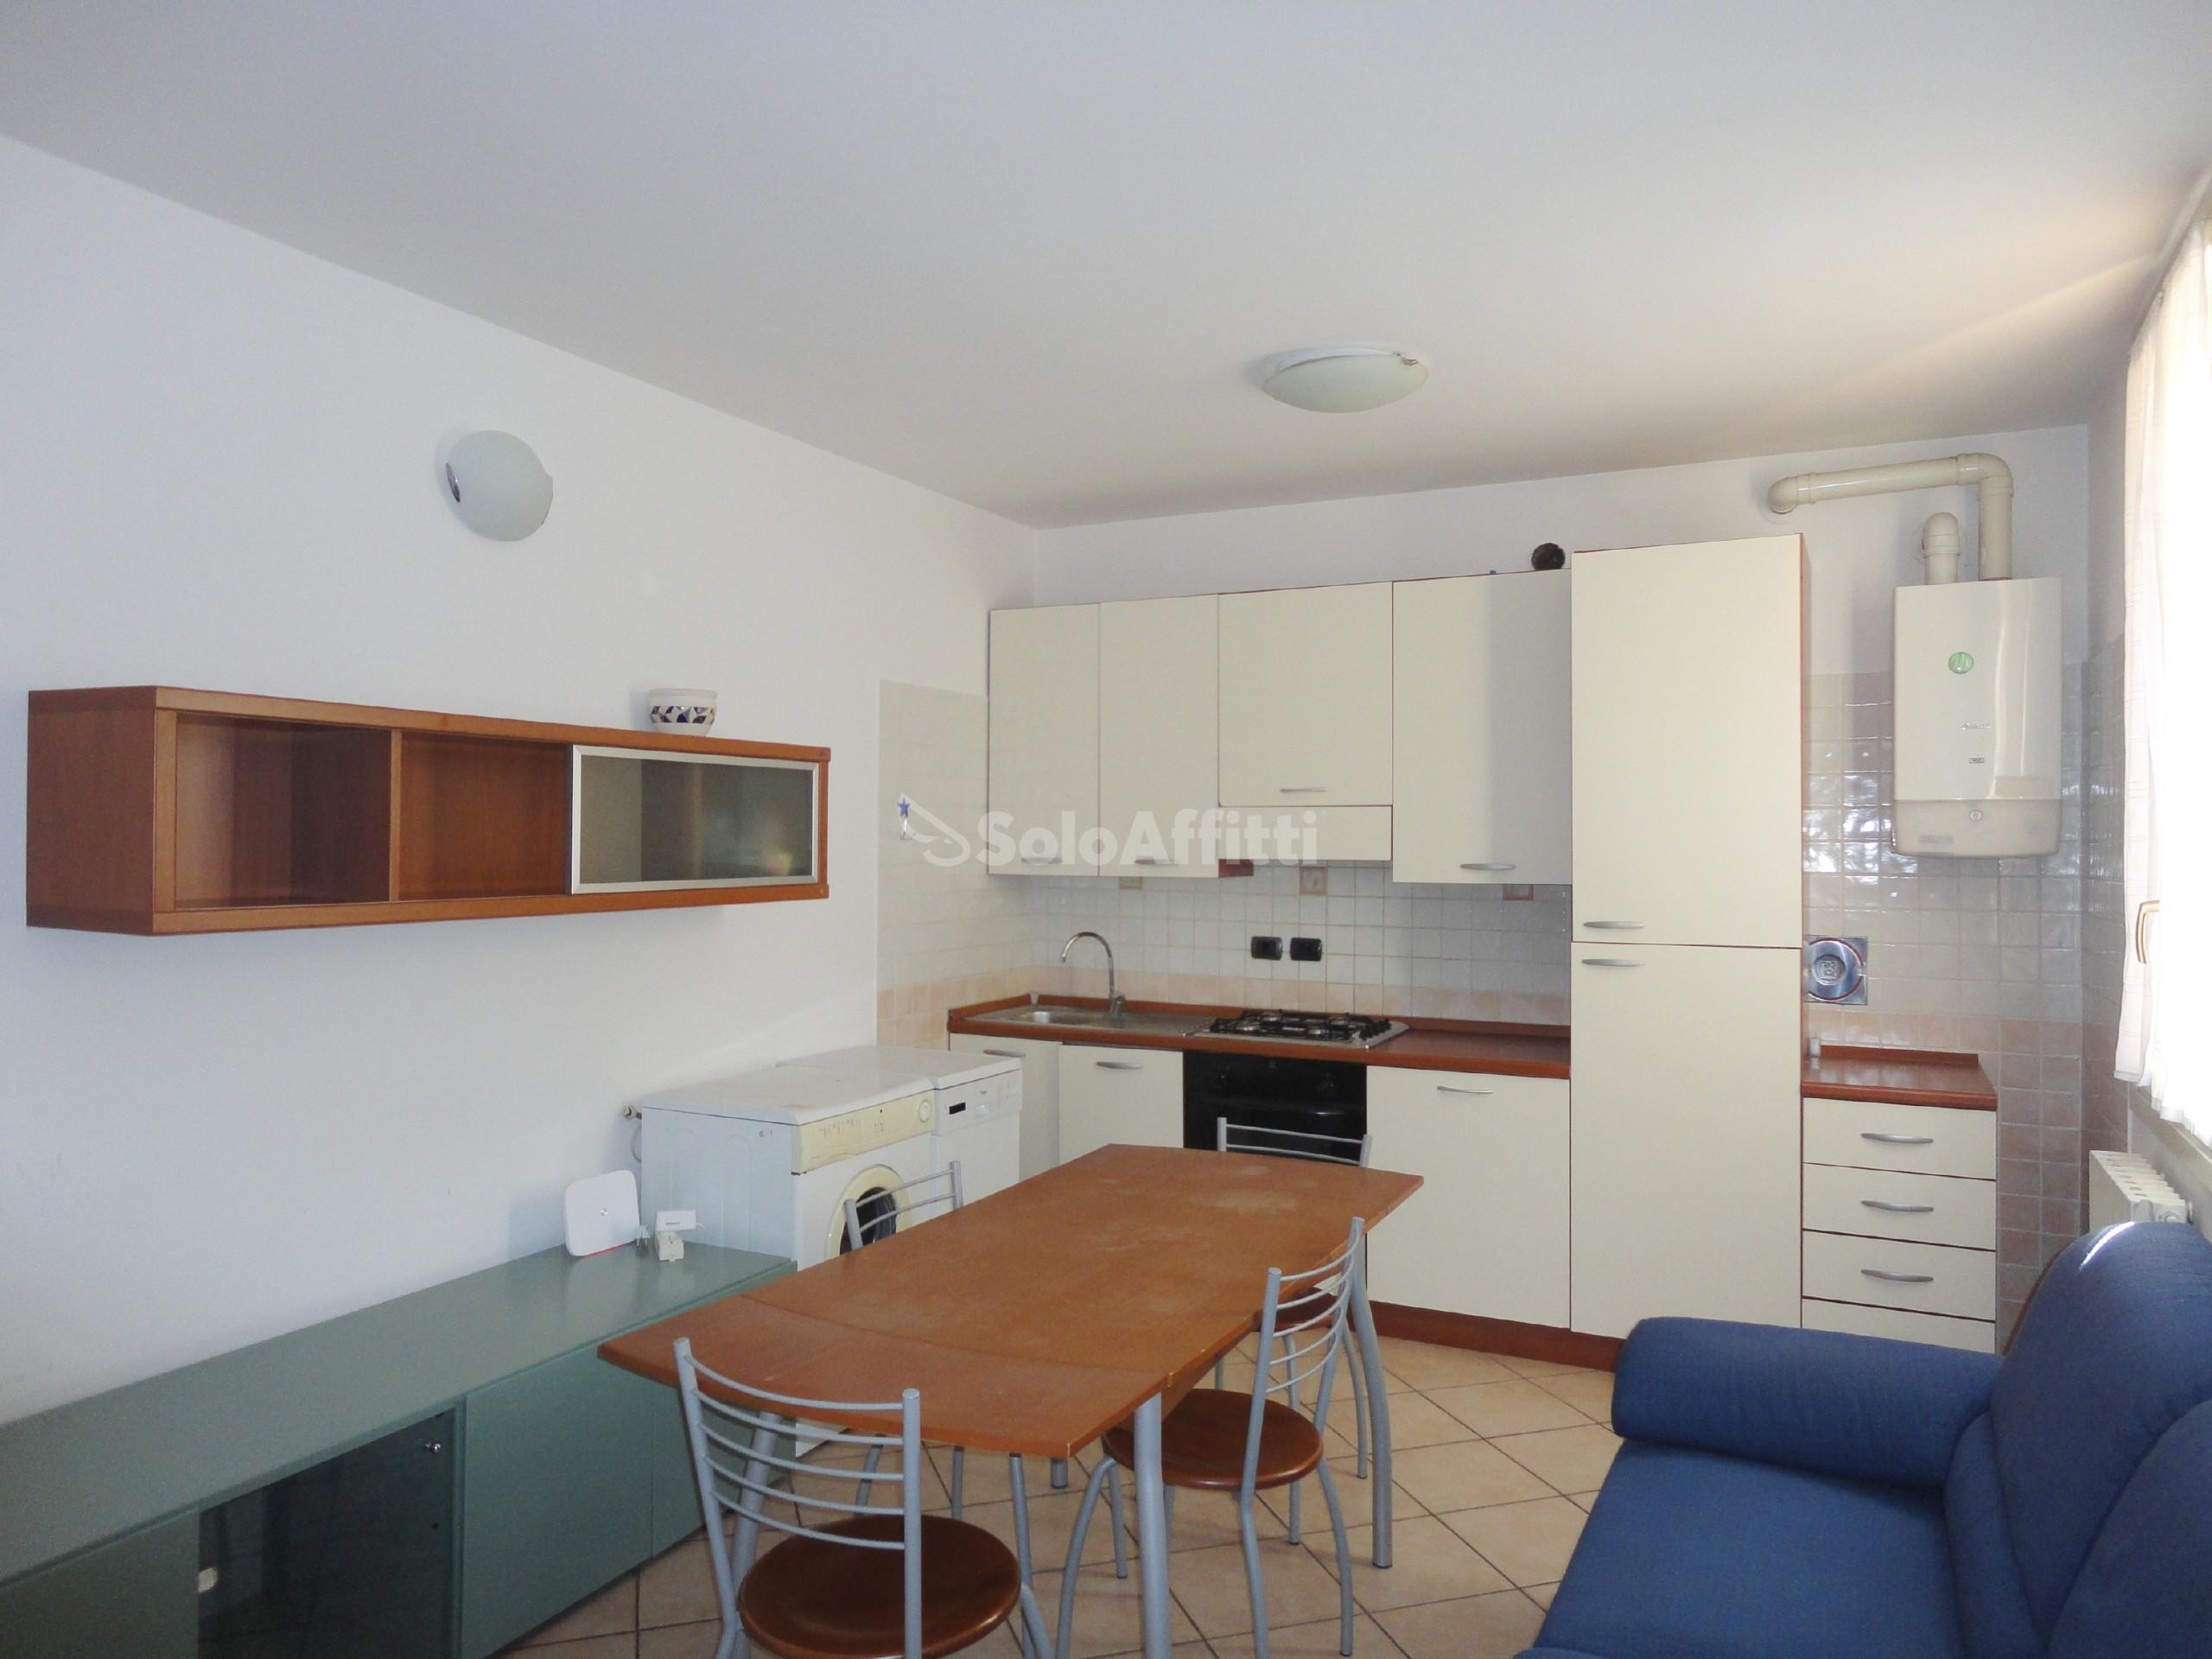 01 - Sala con parete cucina.jpg